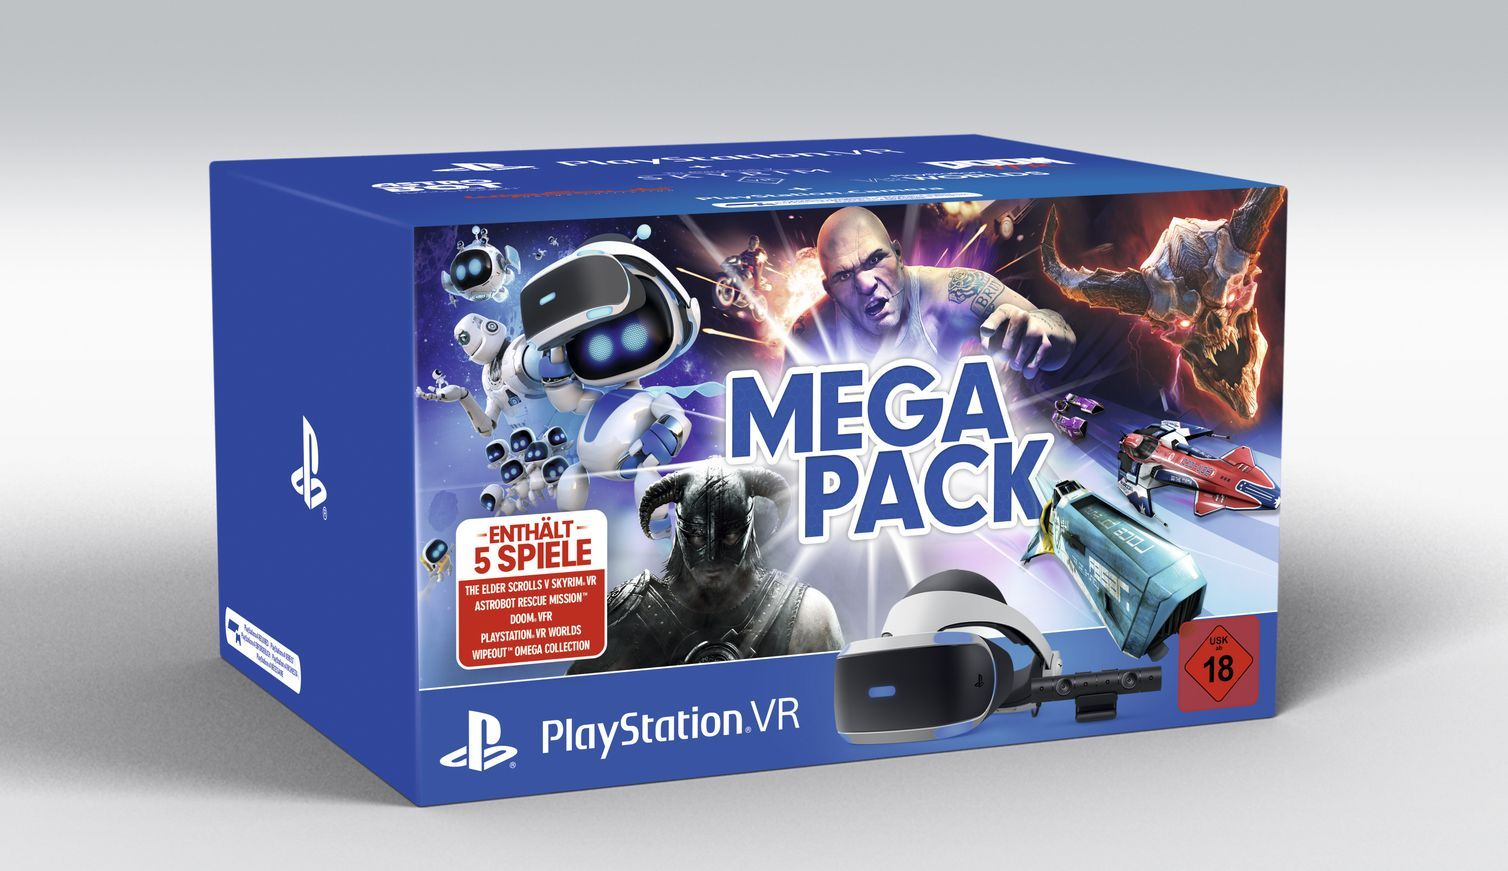 Playstation VR sorgt für Wachstum bei Virtual Reality